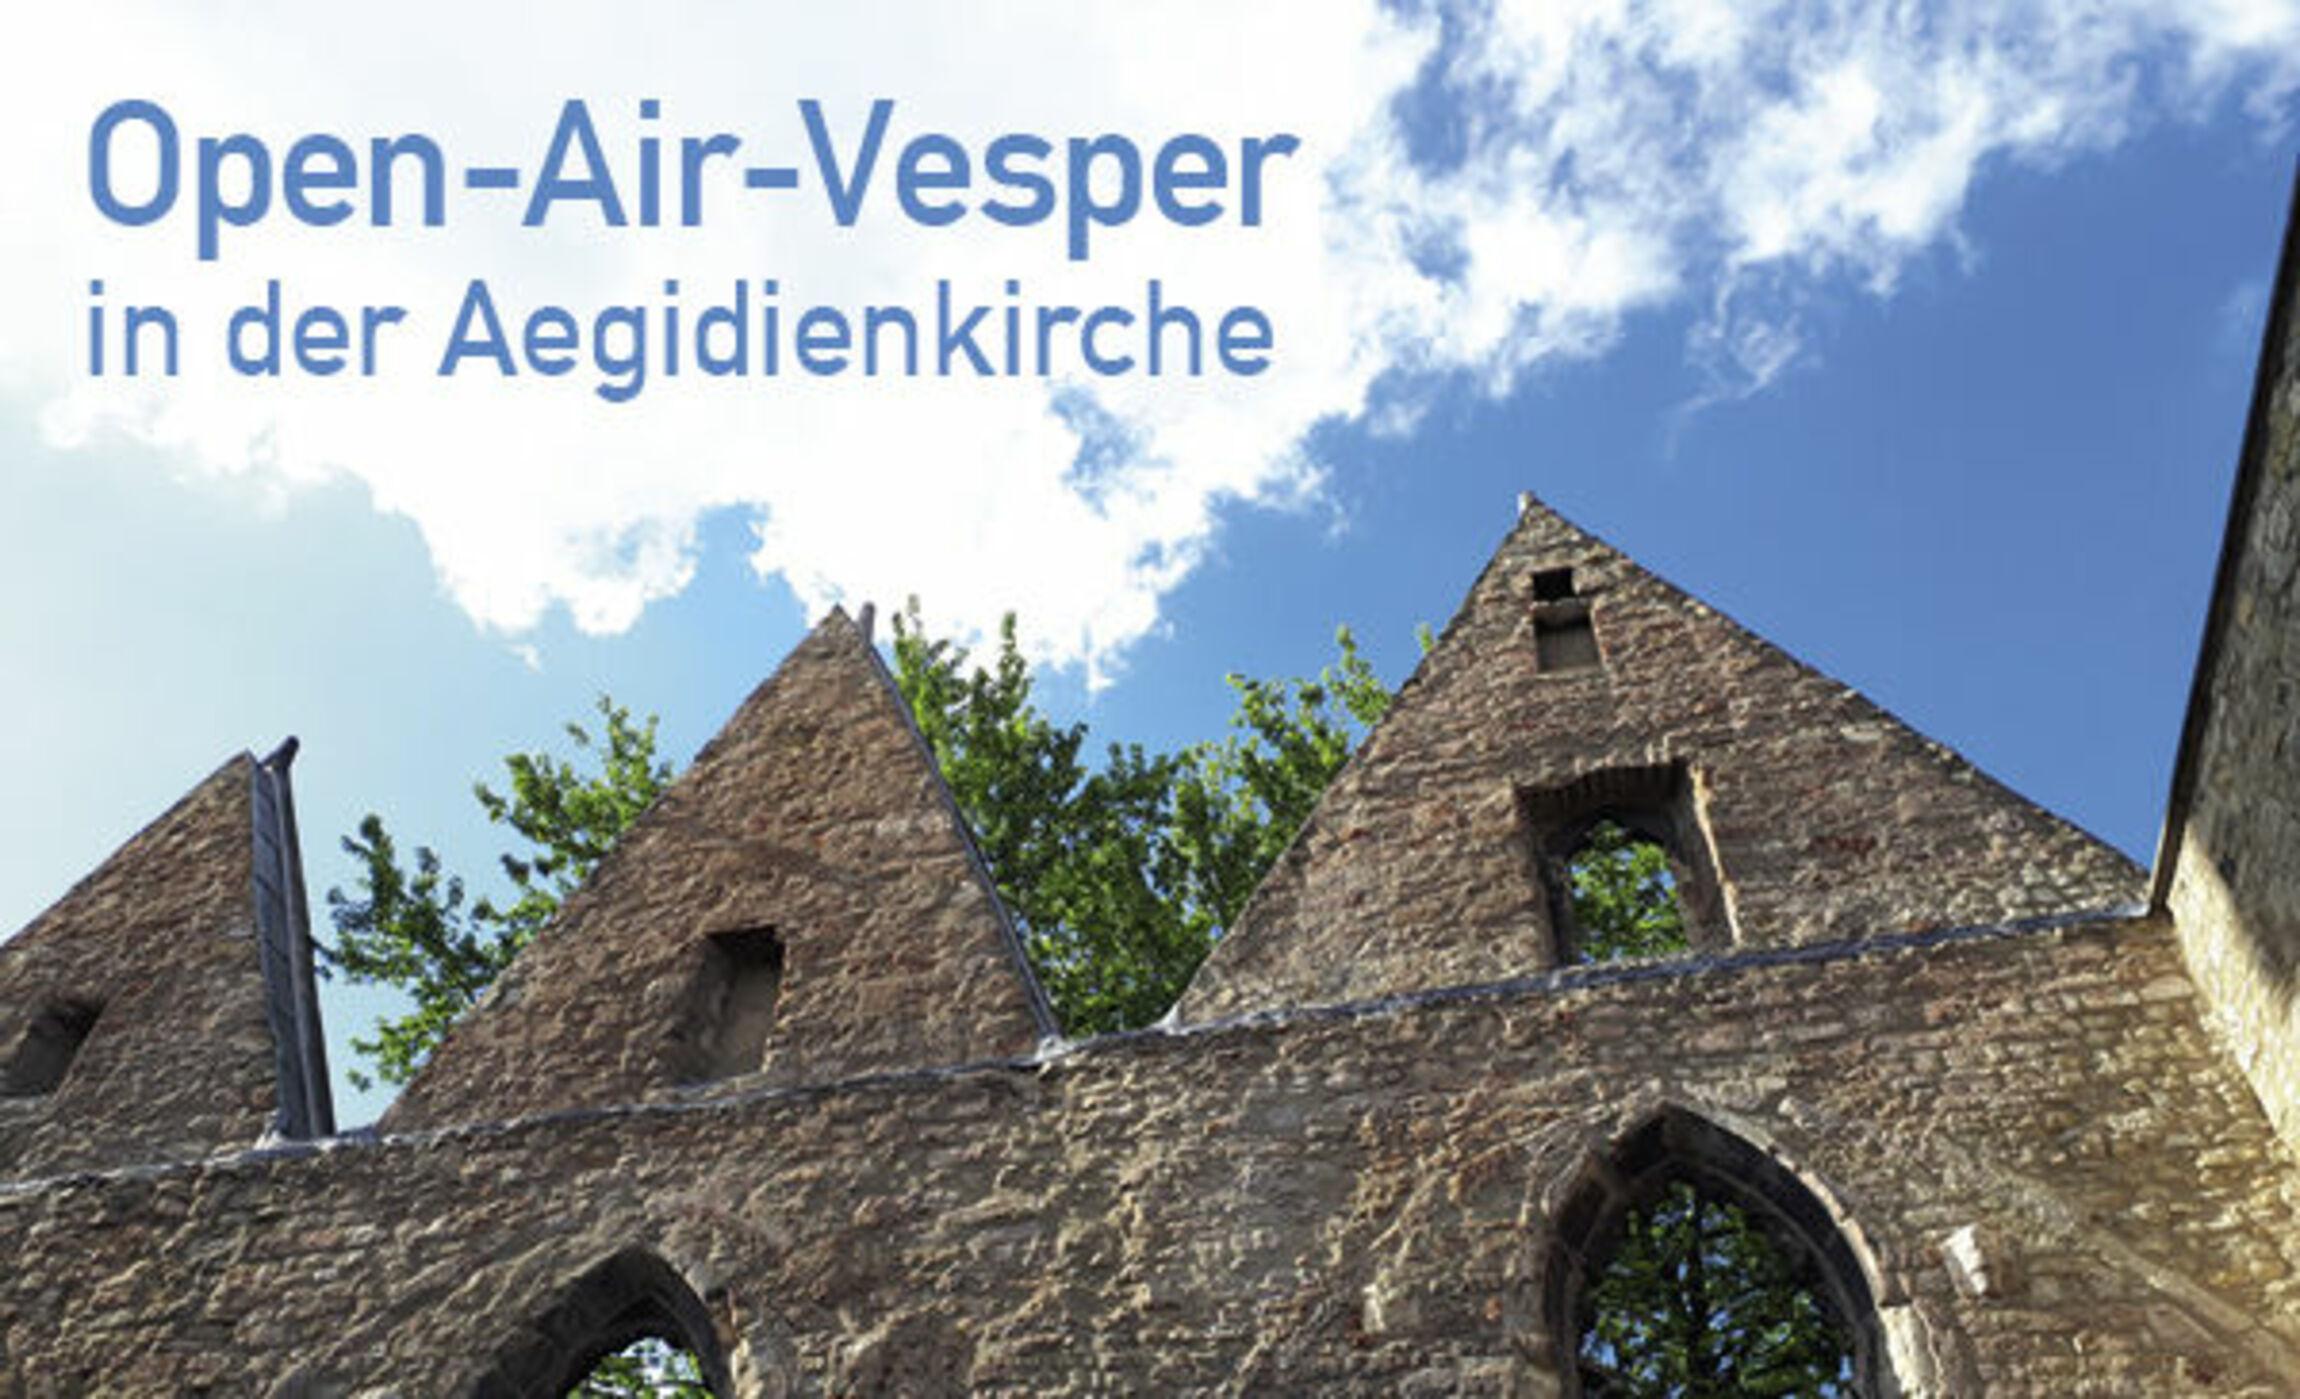 Open Air Vesper Aegidienkirche